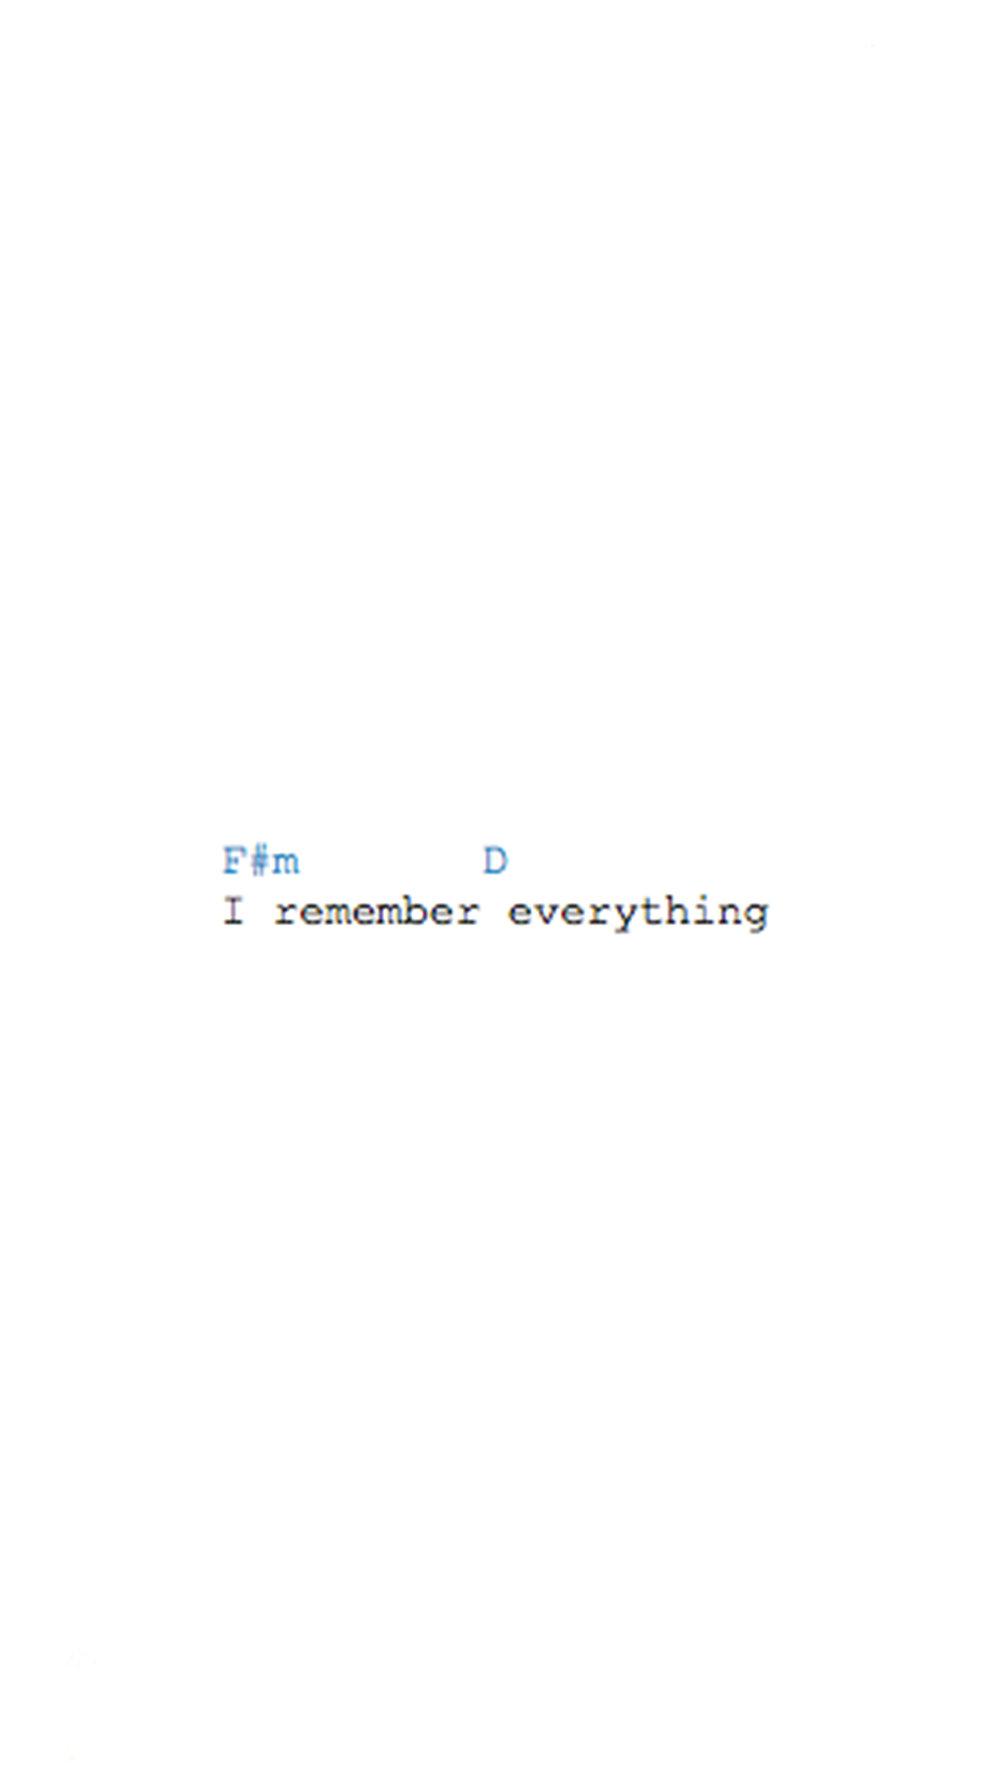 remembering.jpg